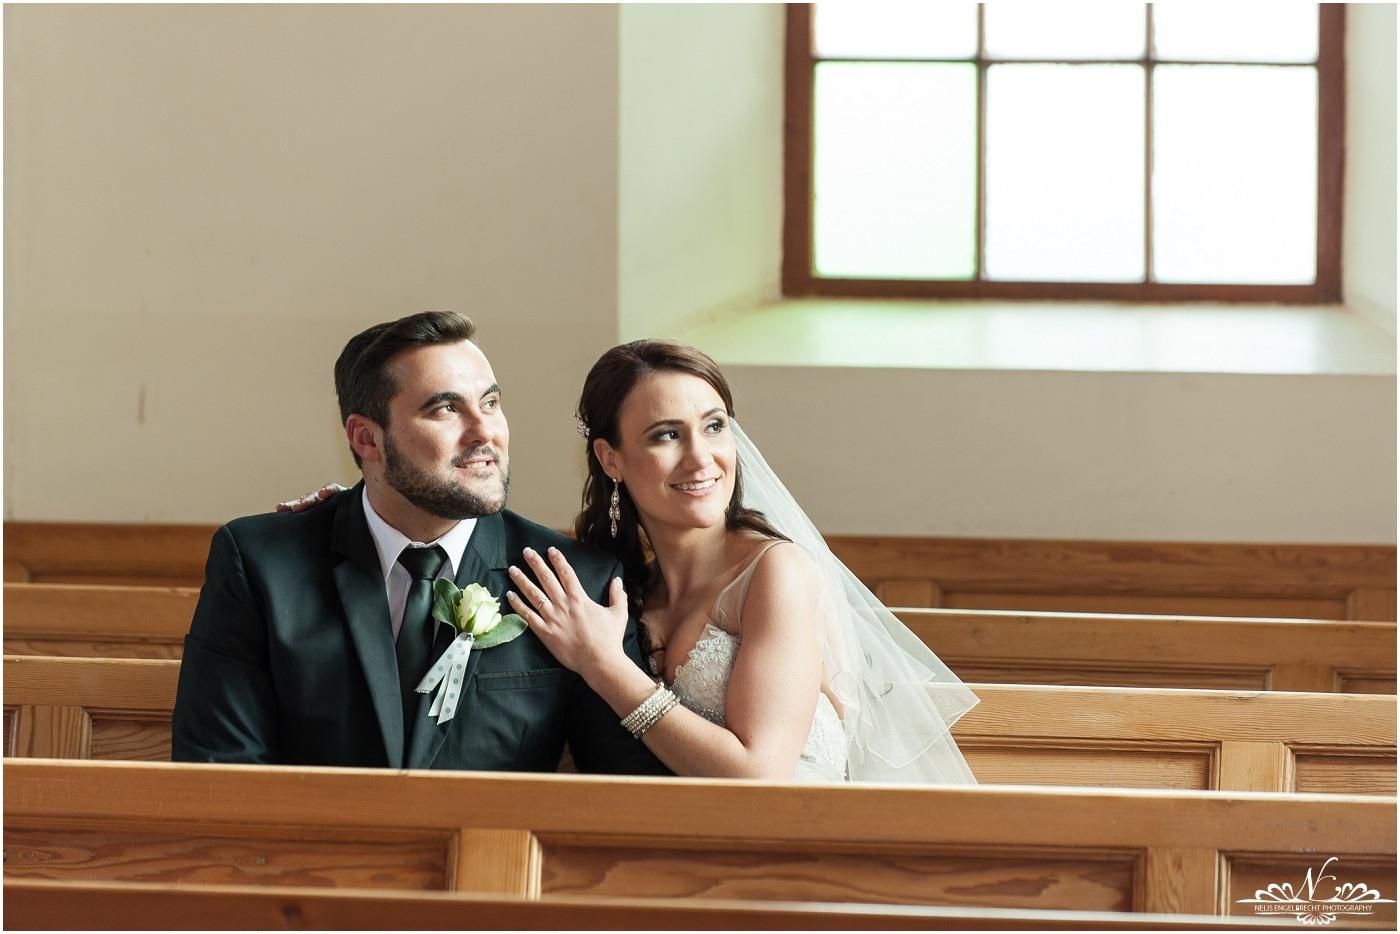 Eensgezind-Wedding-Photos-Nelis-Engelbrecht-Photography-073